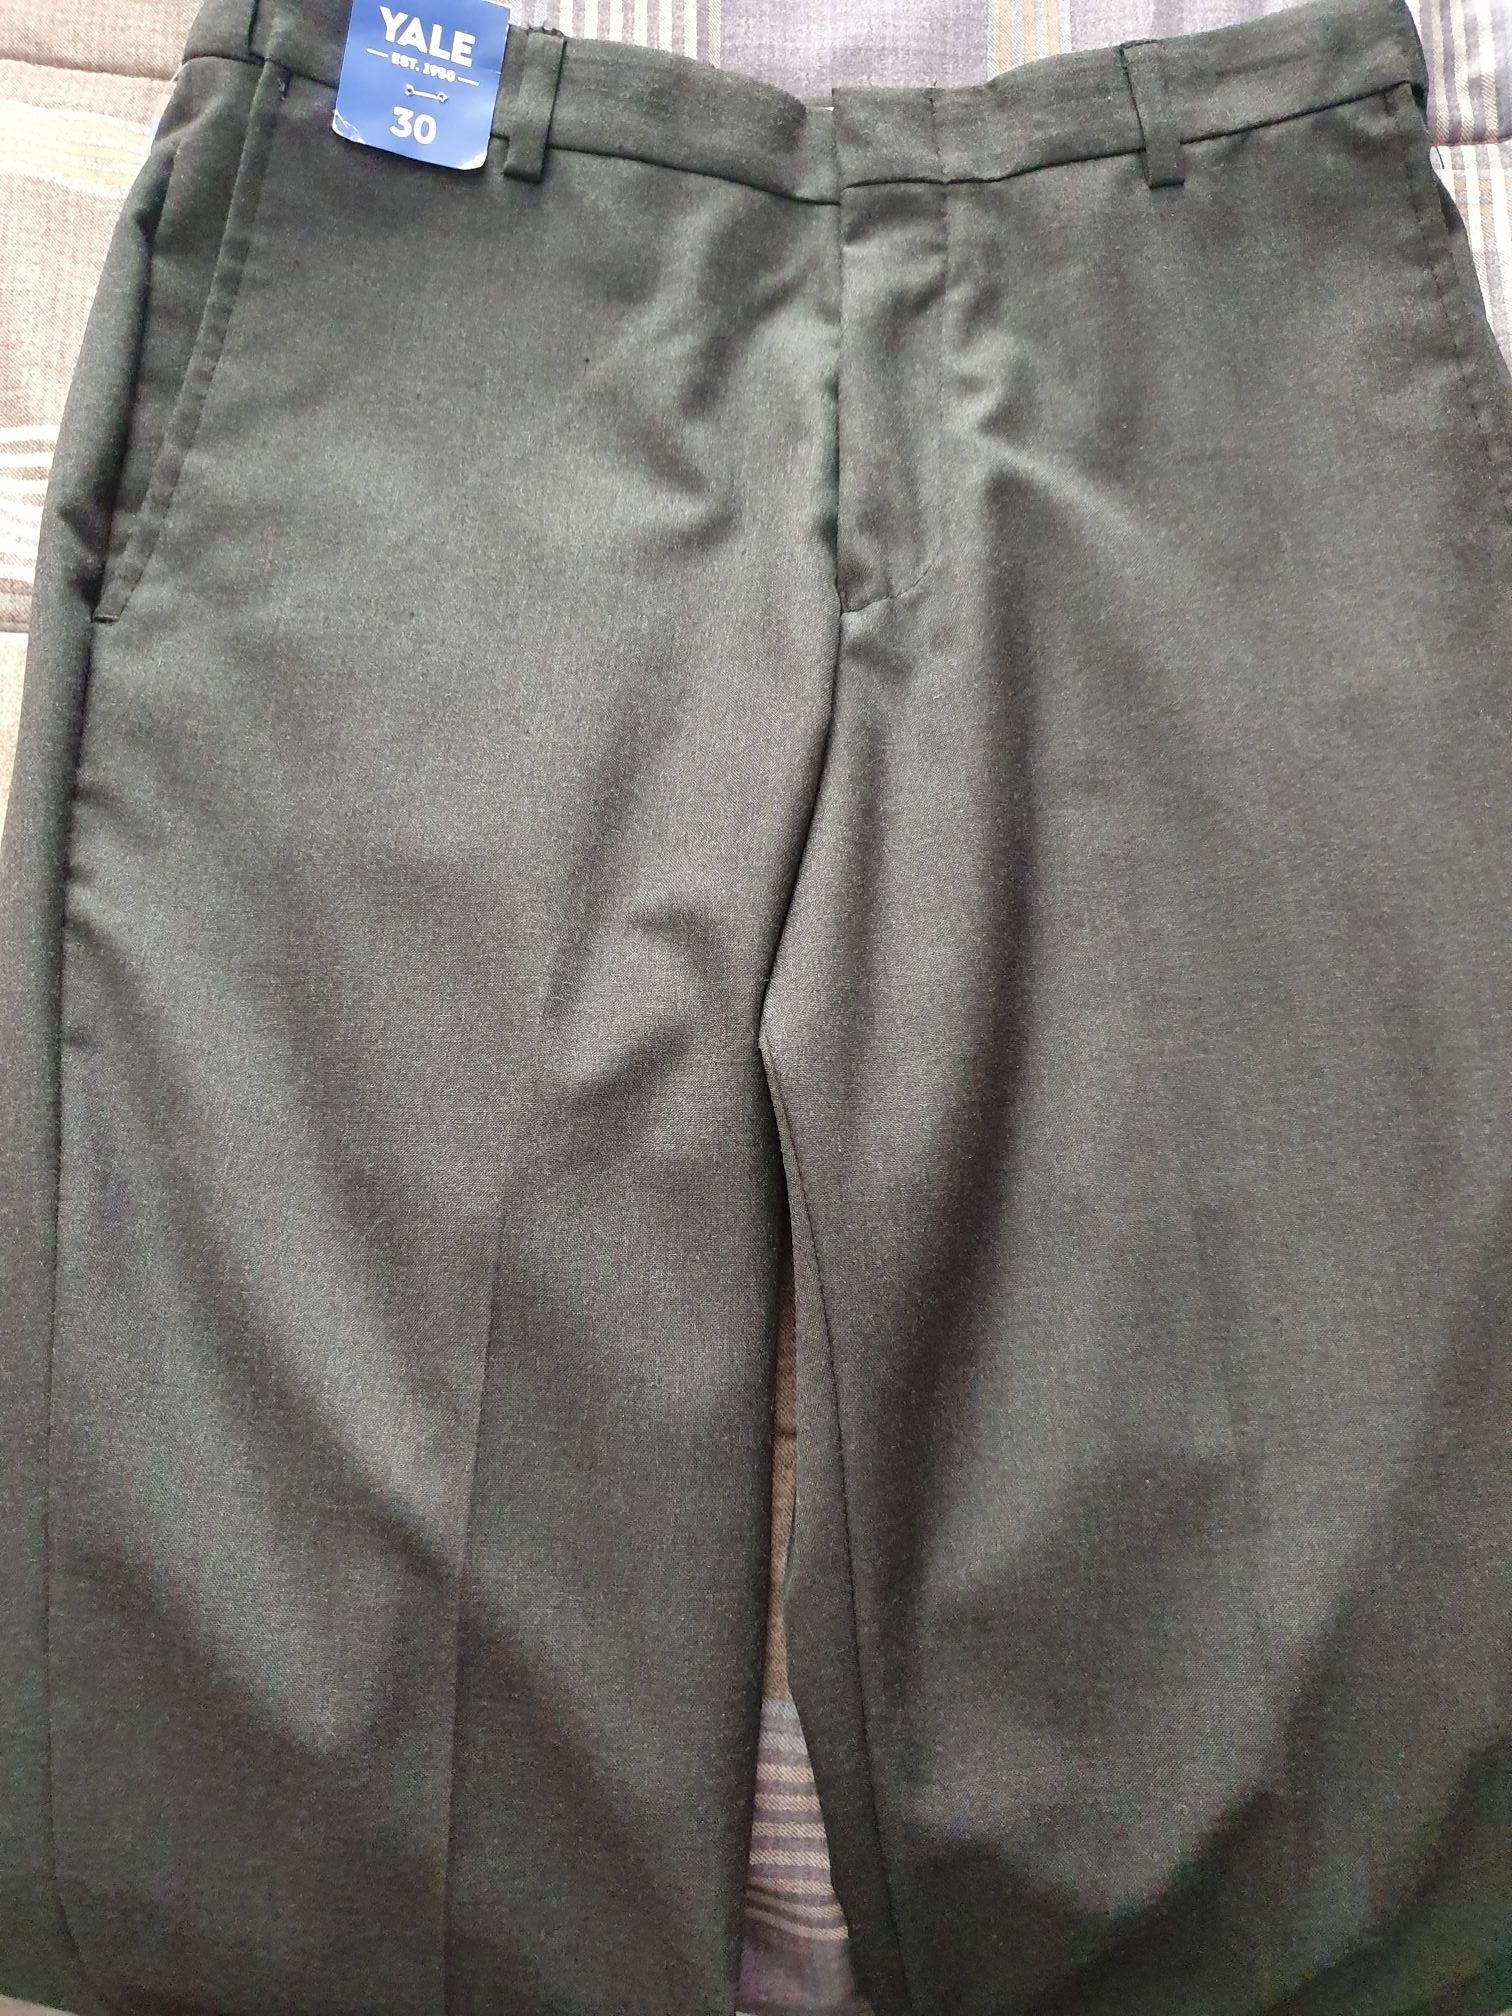 Walmart - Pantalón Yale de cintura ajustable